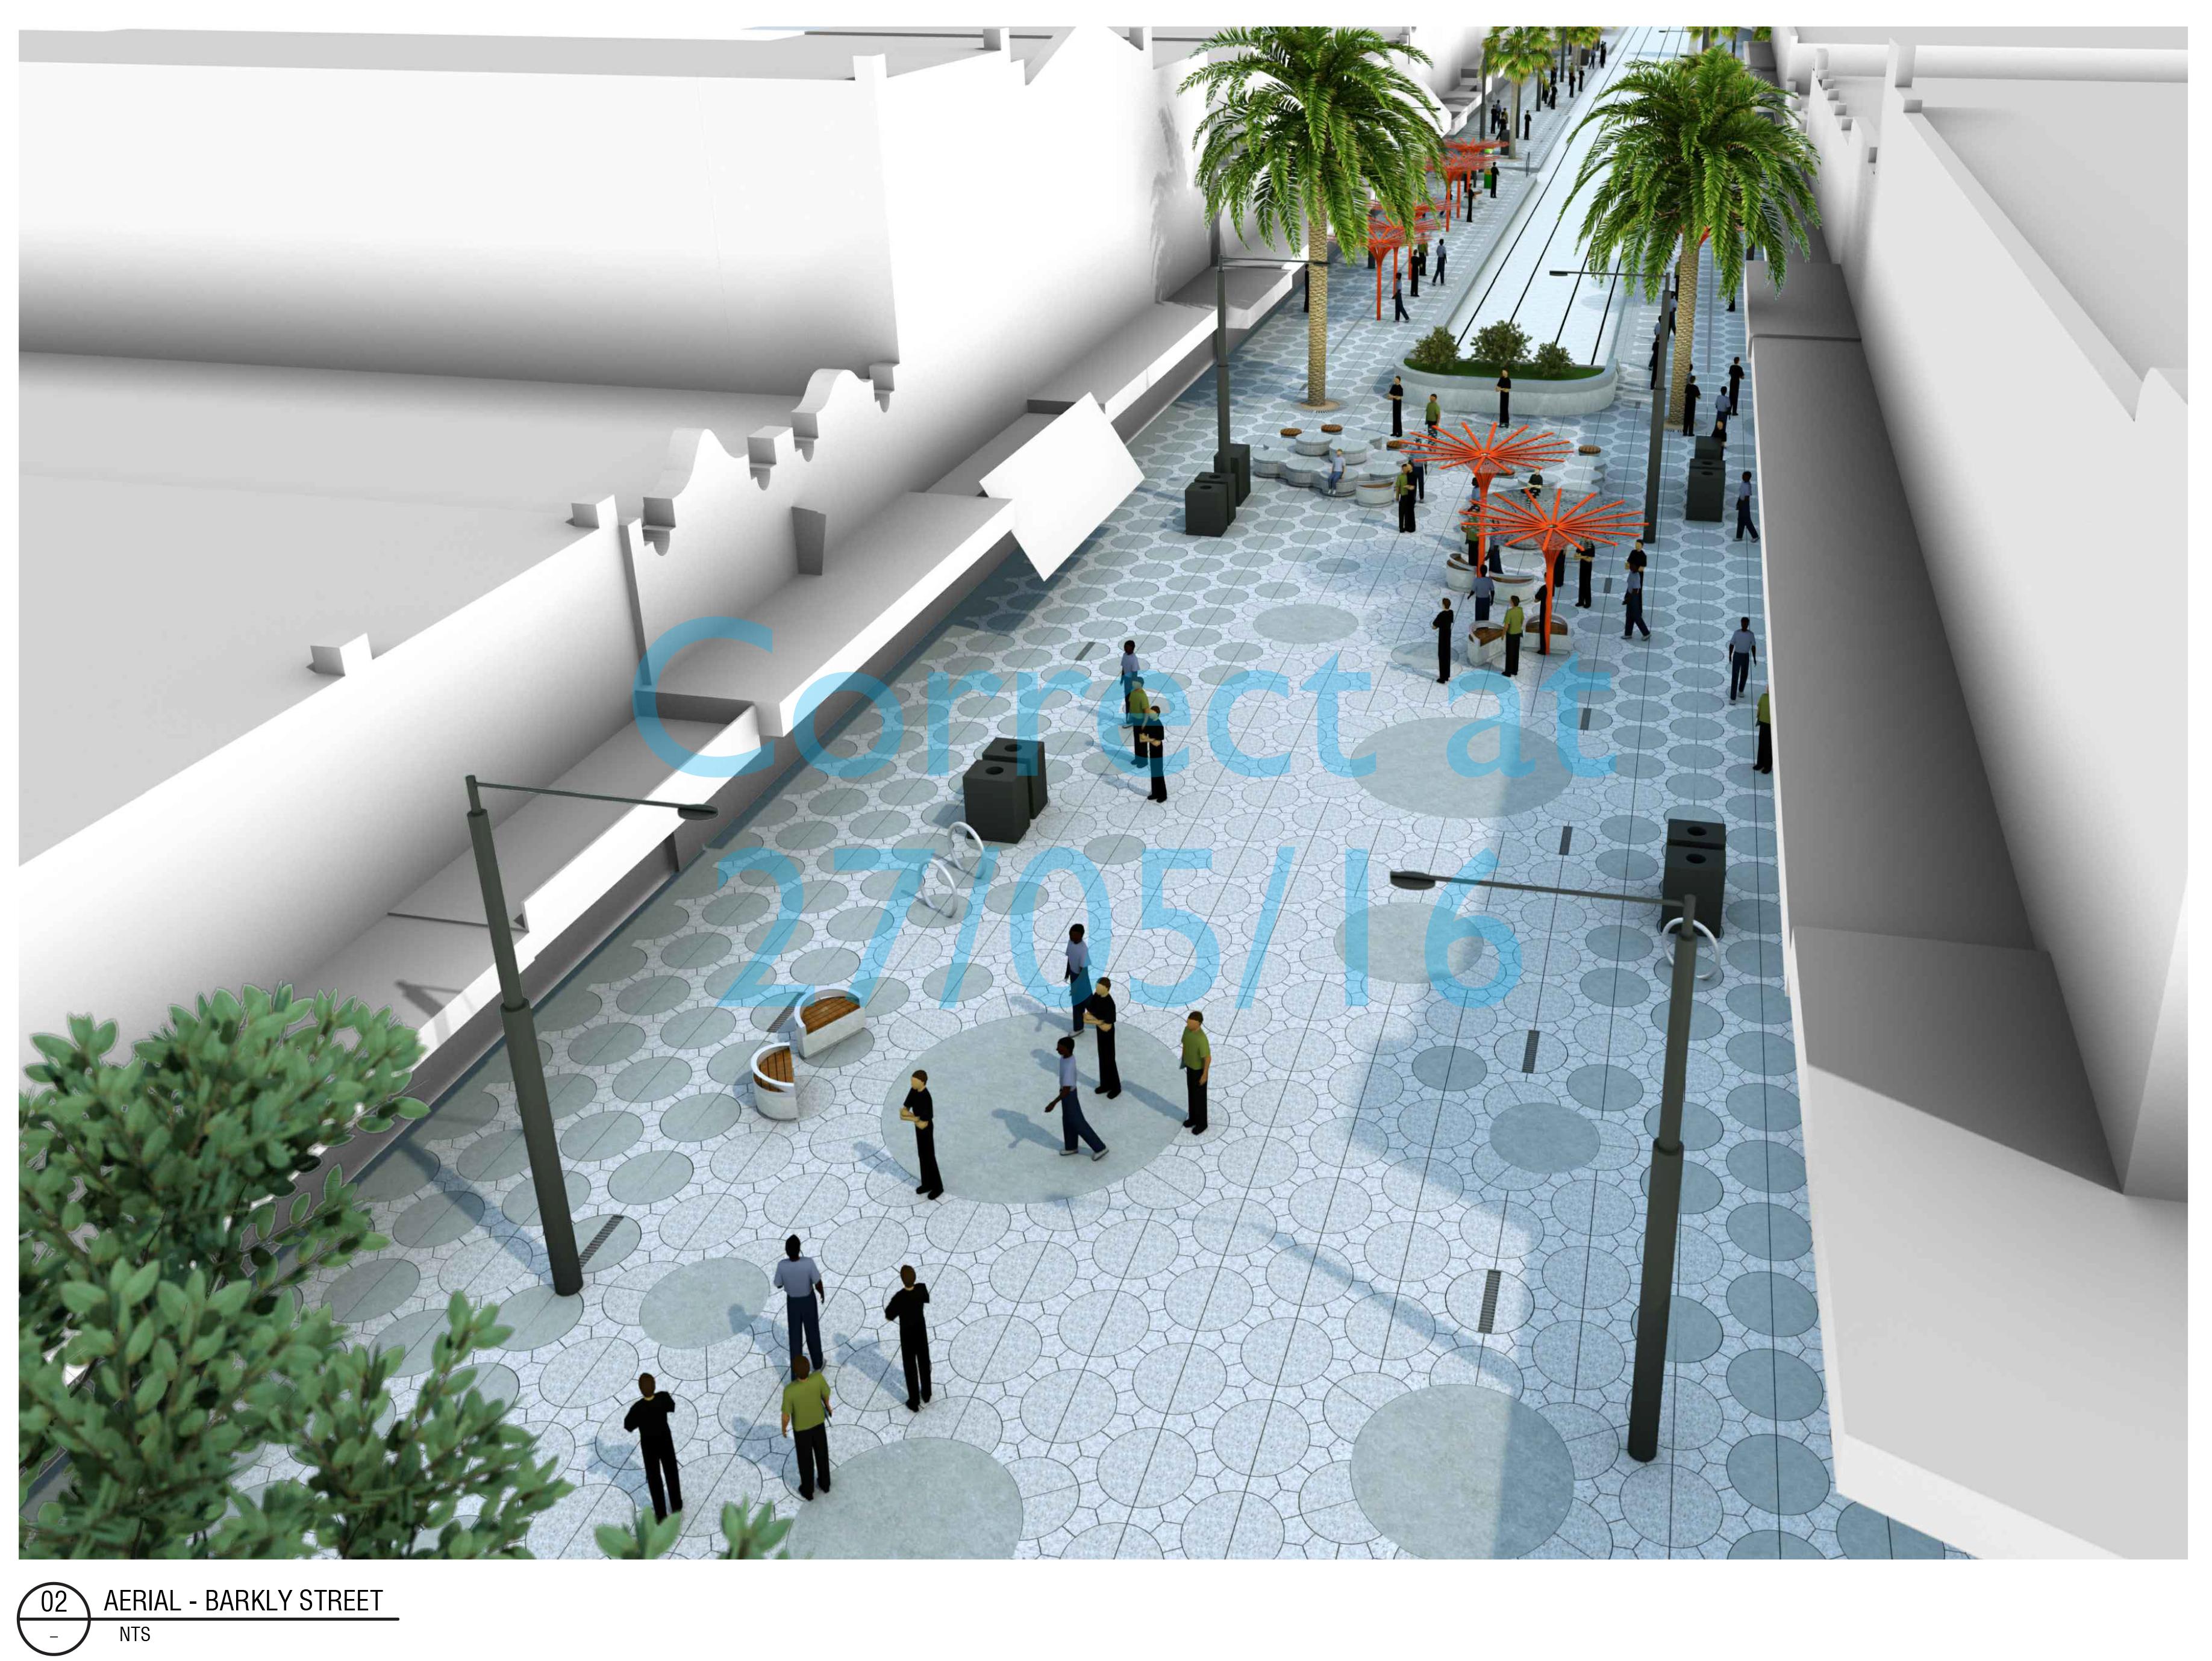 Acland_street_detailed_design-5